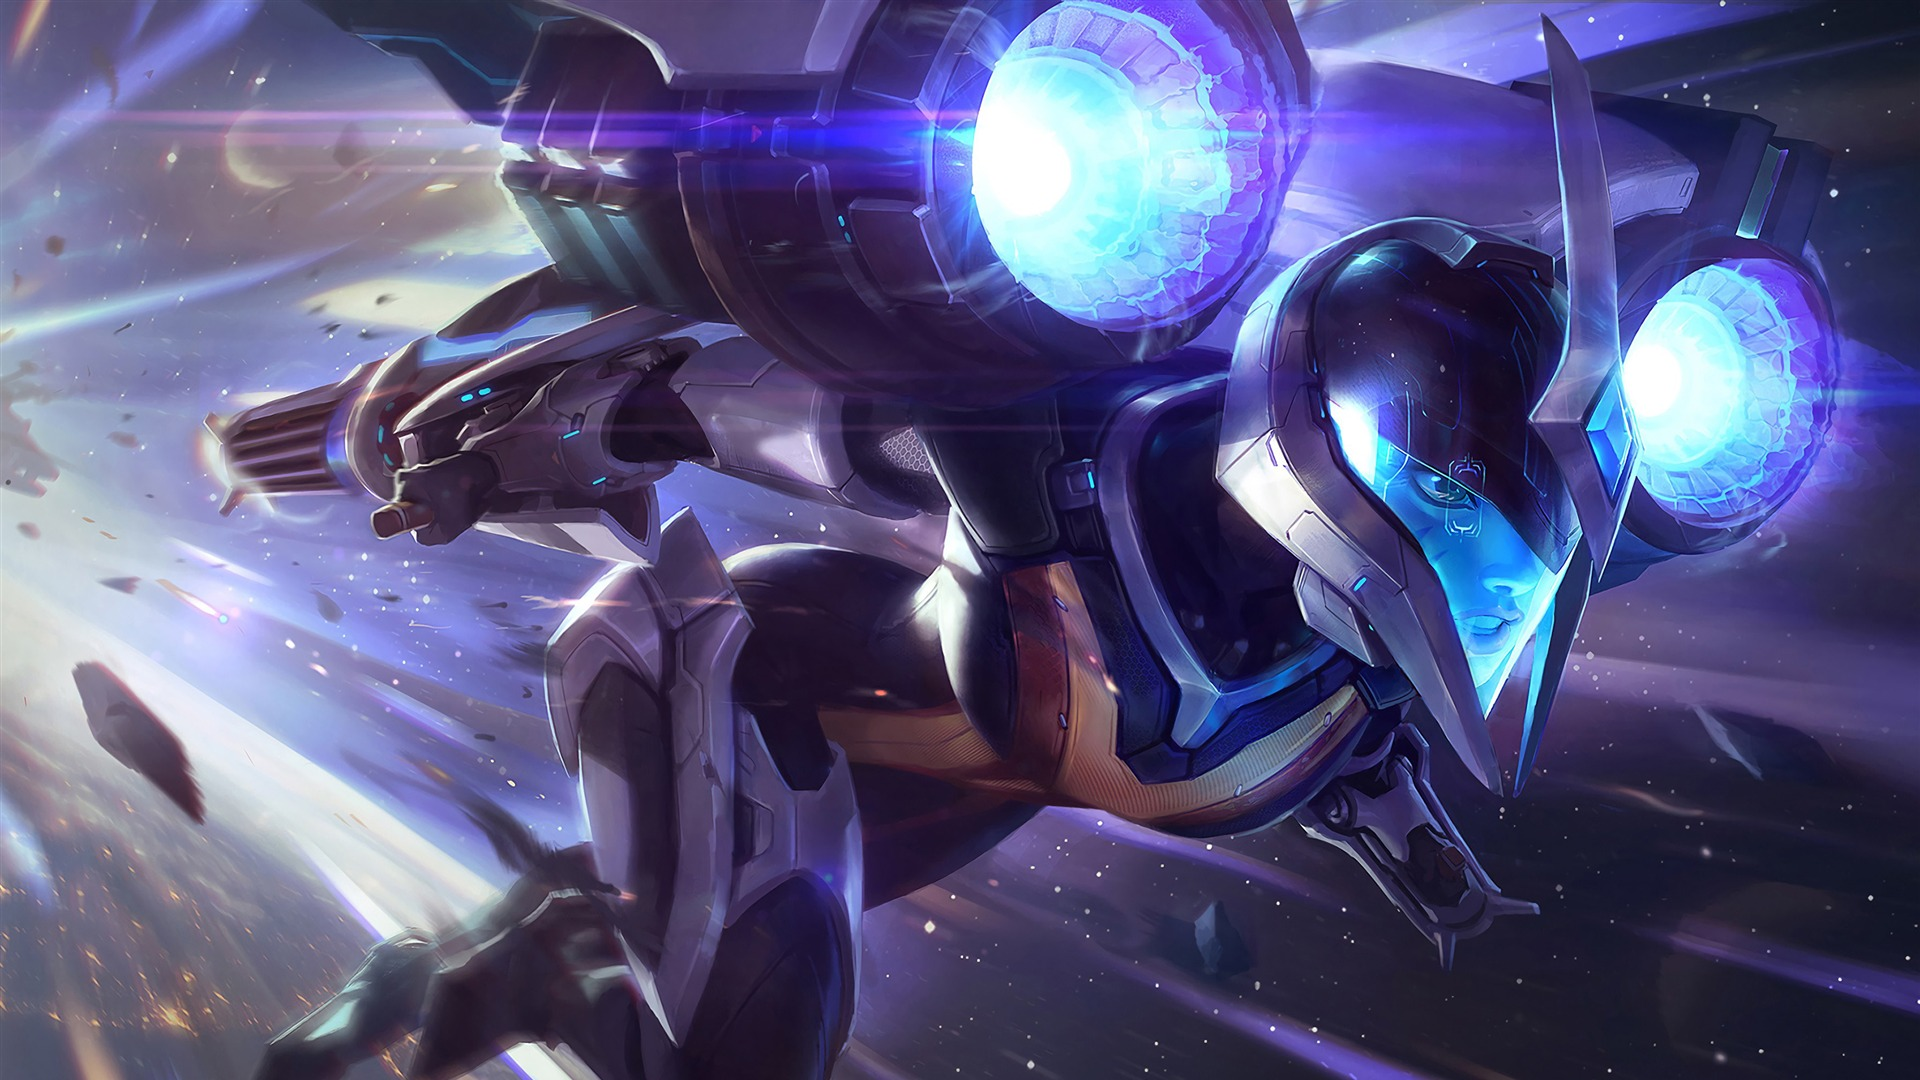 League Of Legends Kaisa 2018 Hd Game Preview 10wallpaper Com